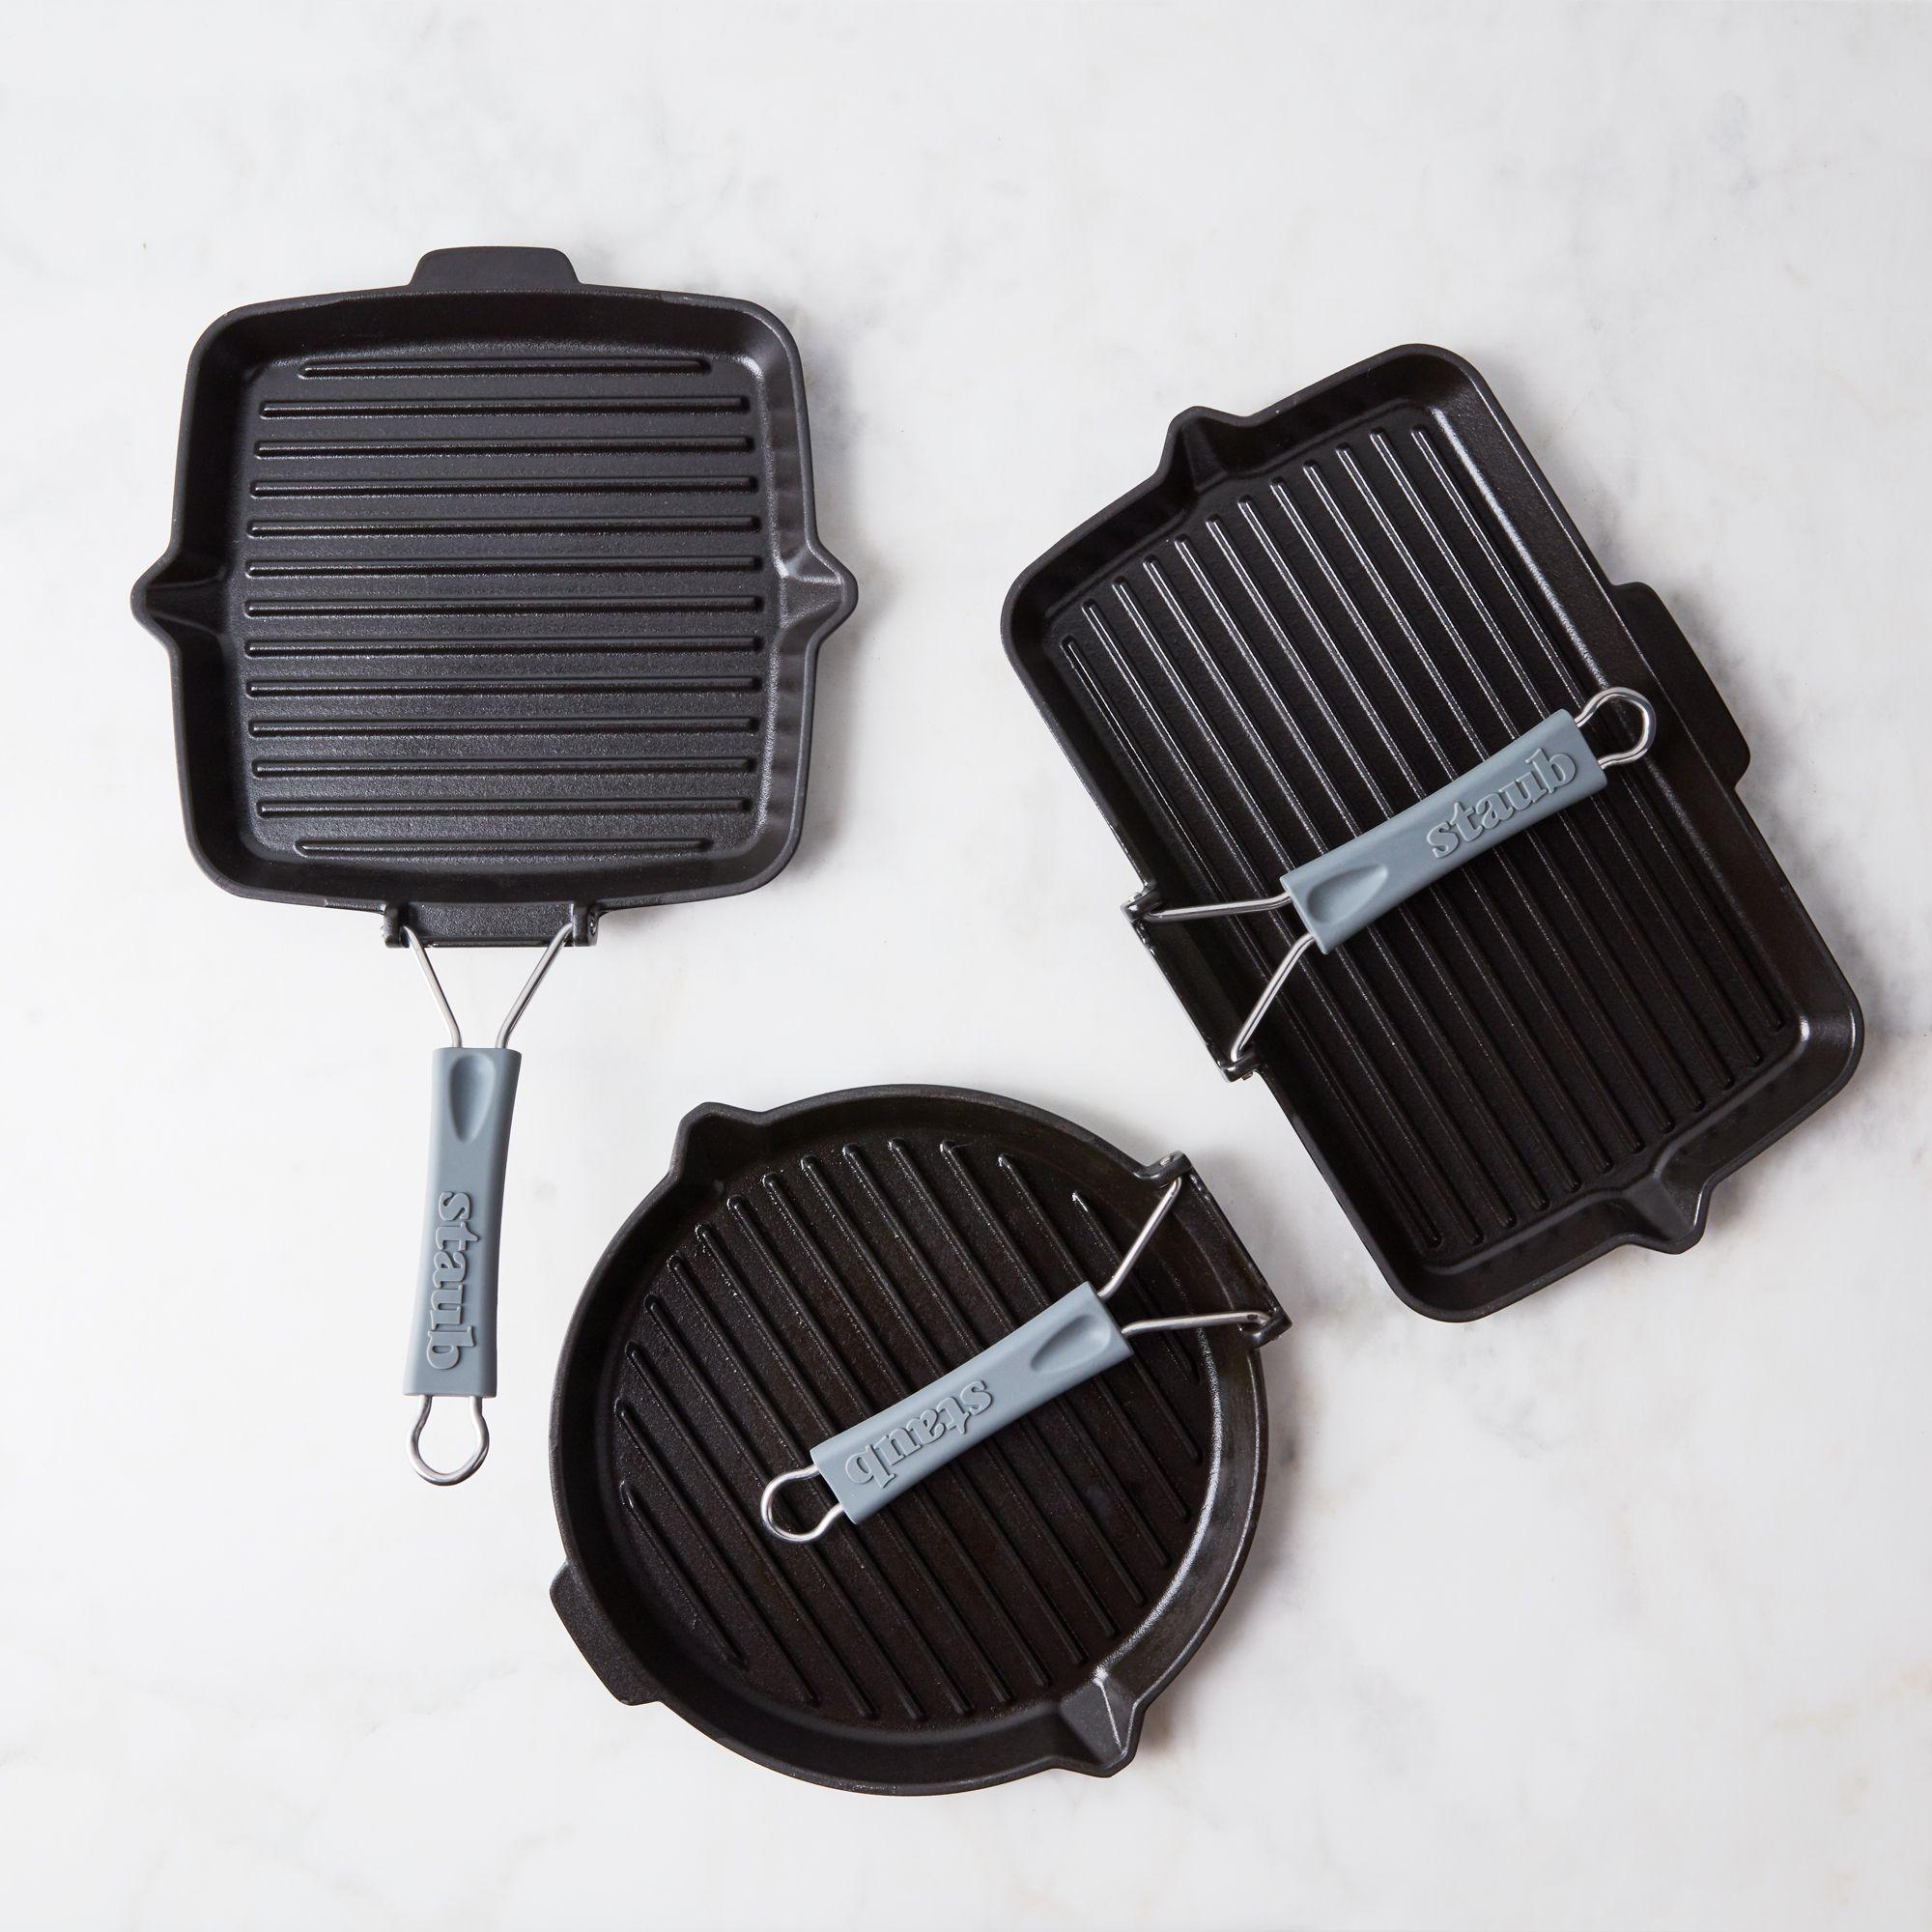 Staub Cast Iron 10-inch Round Folding Grill Matte Black